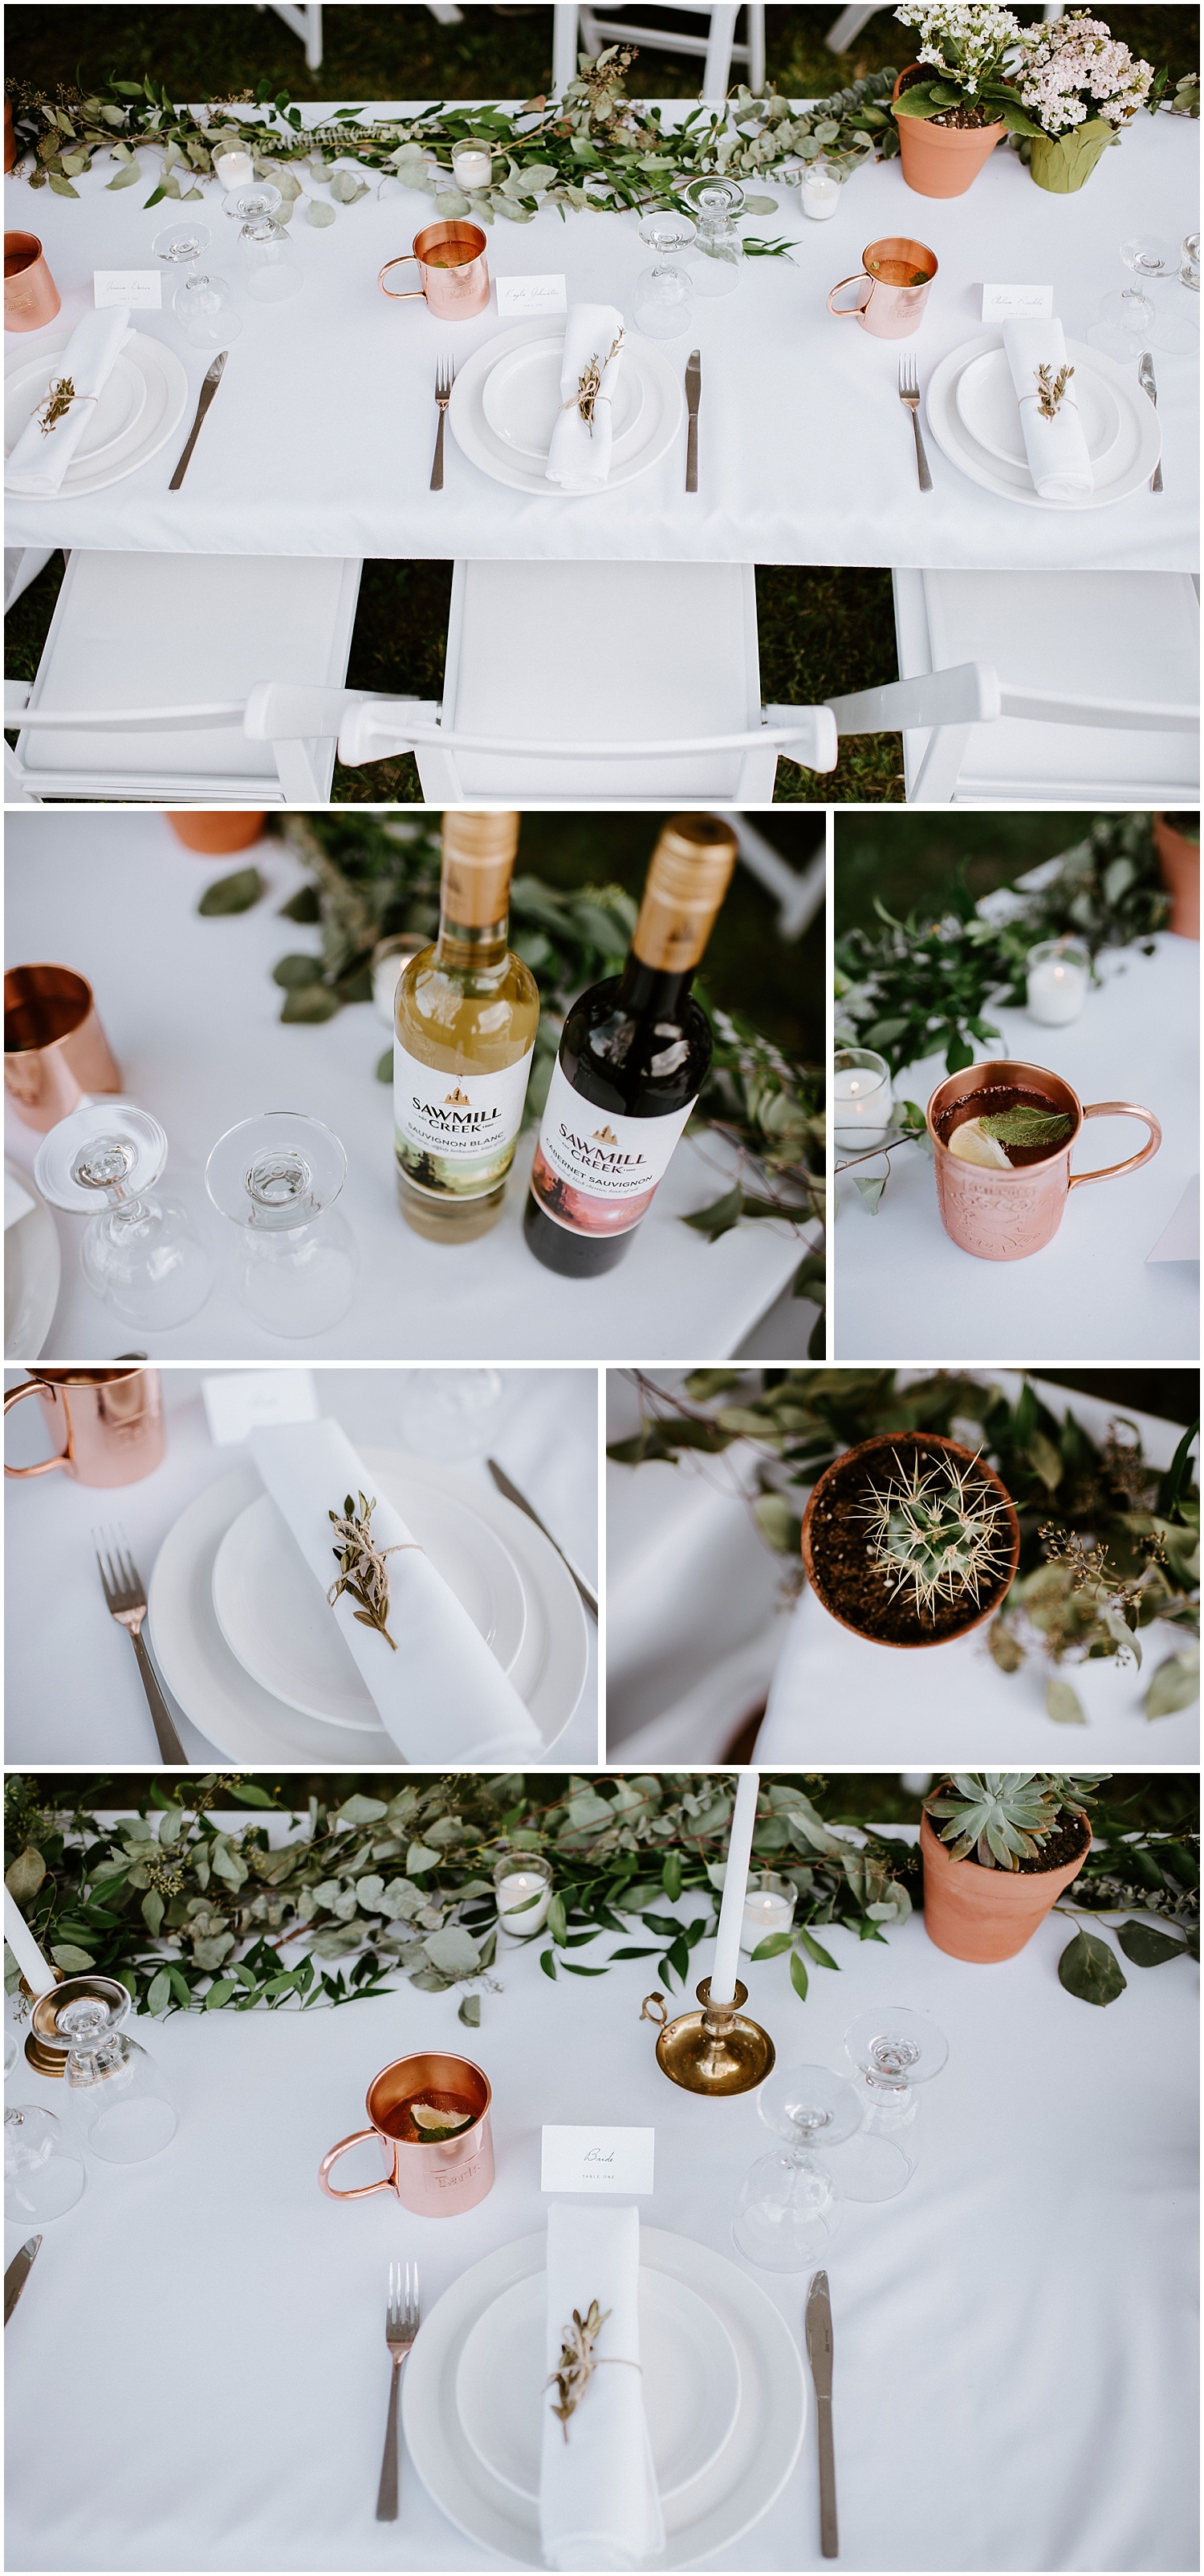 Quesnel_wedding_vancouver_bc_elopement_Pinnacles_Provincial_Park_0230.jpg